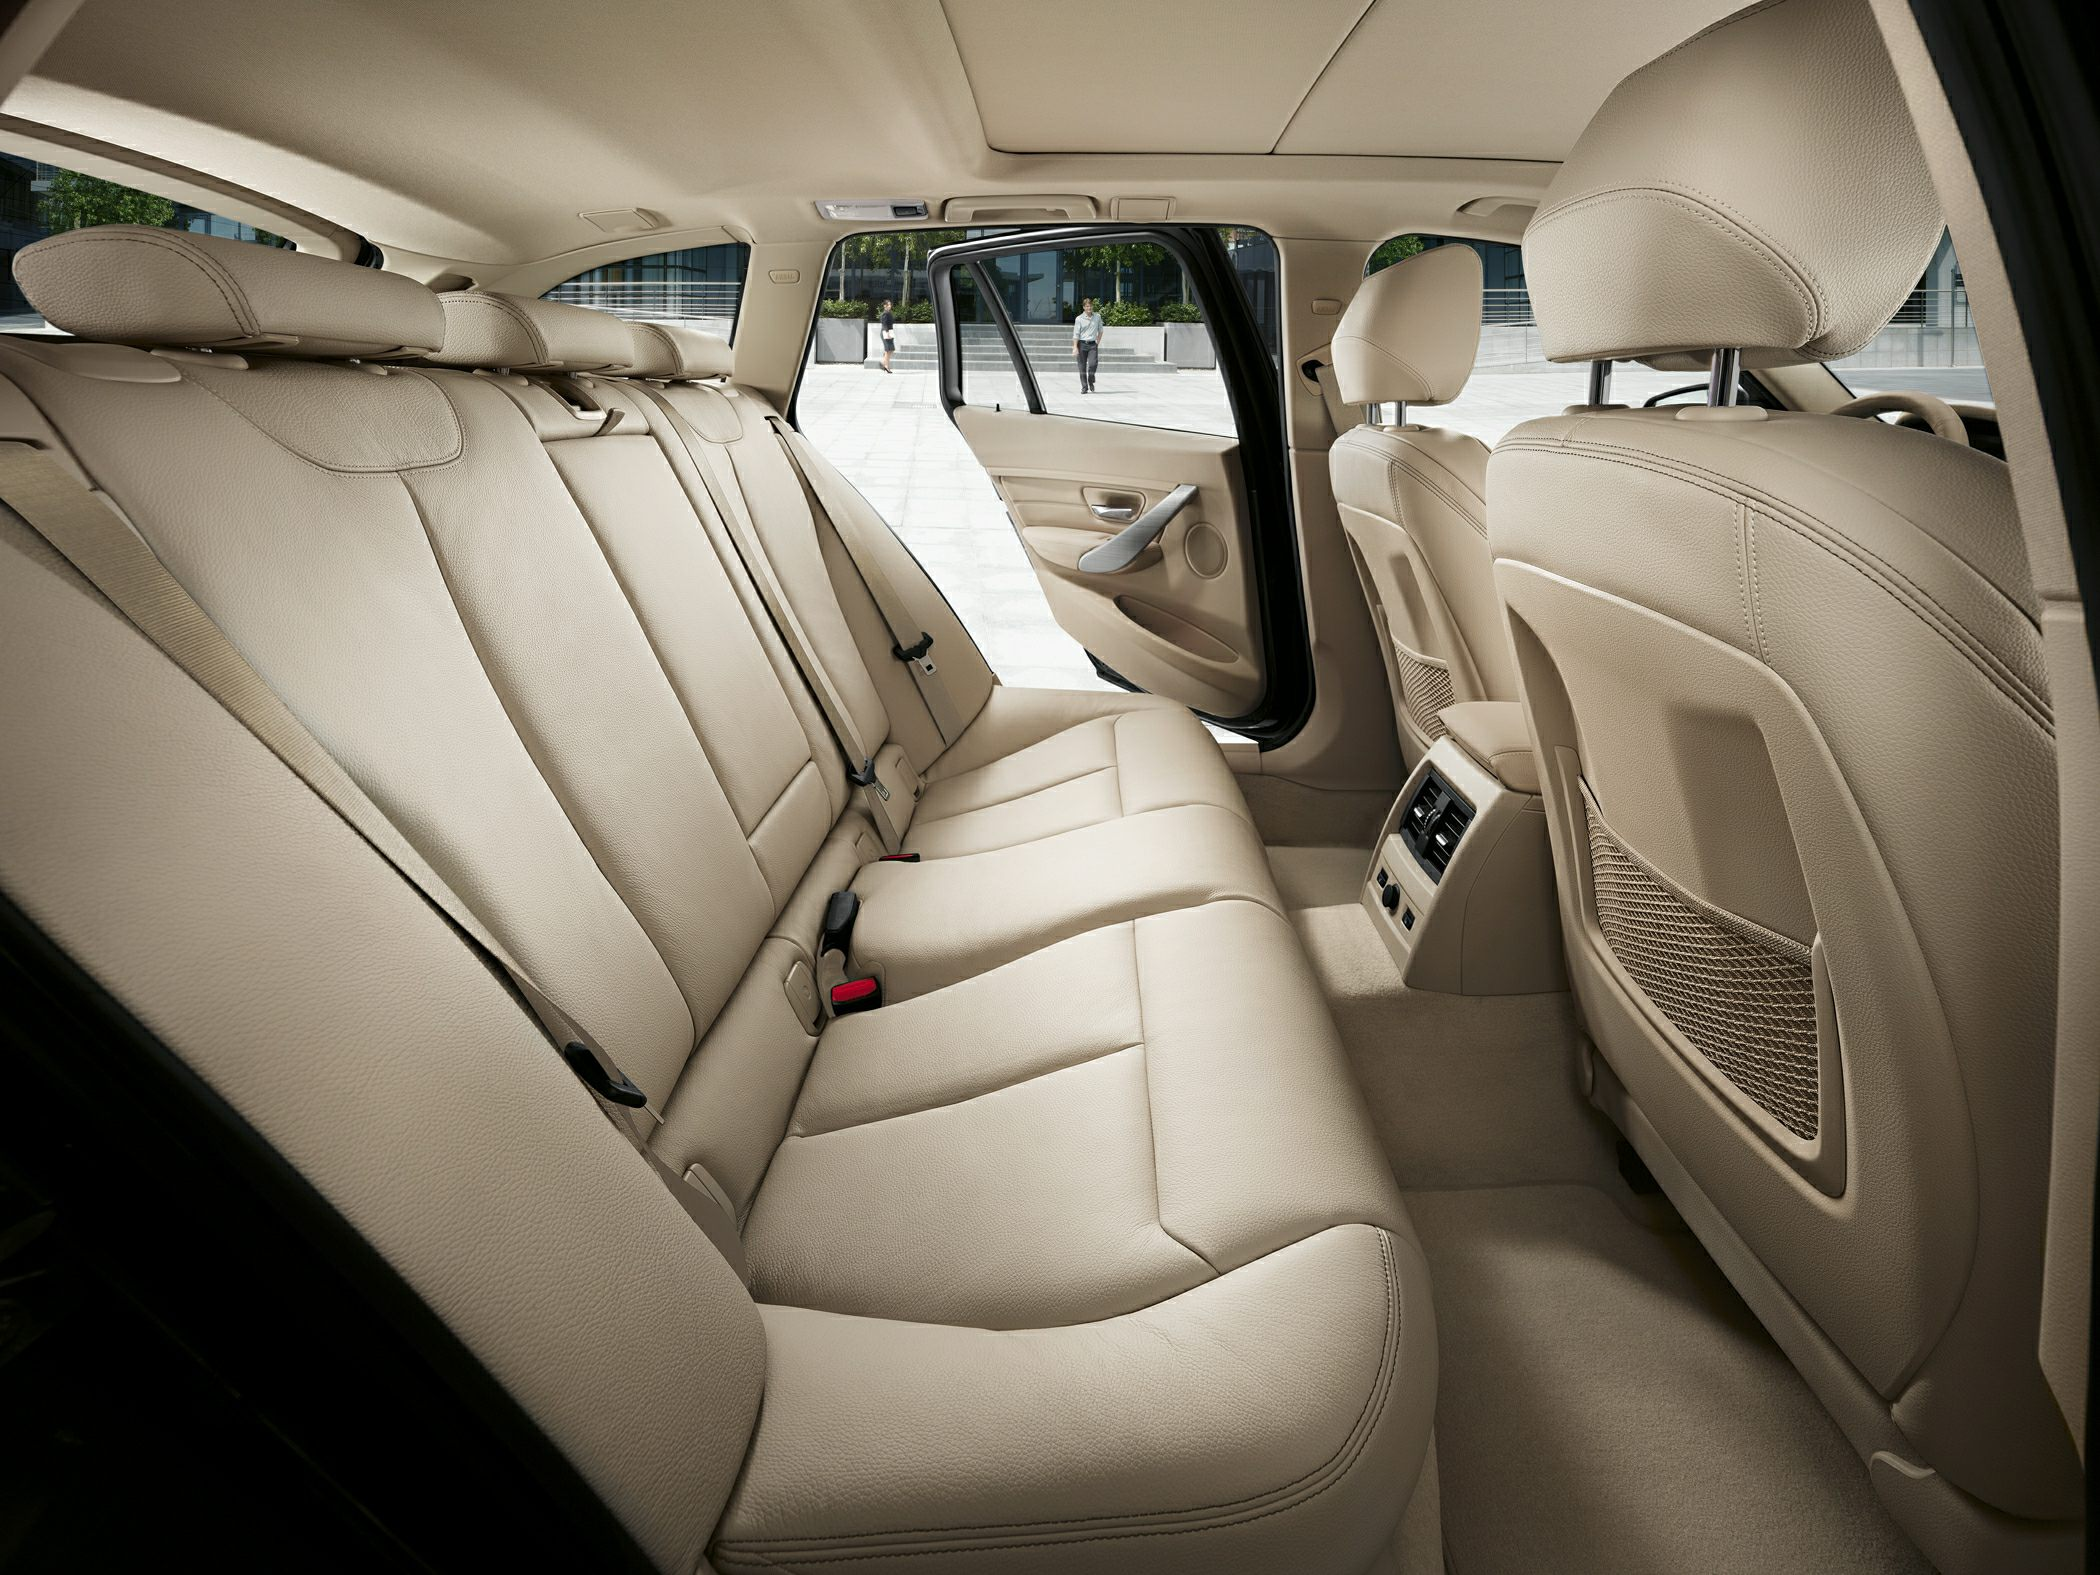 BMW 328d Back seat